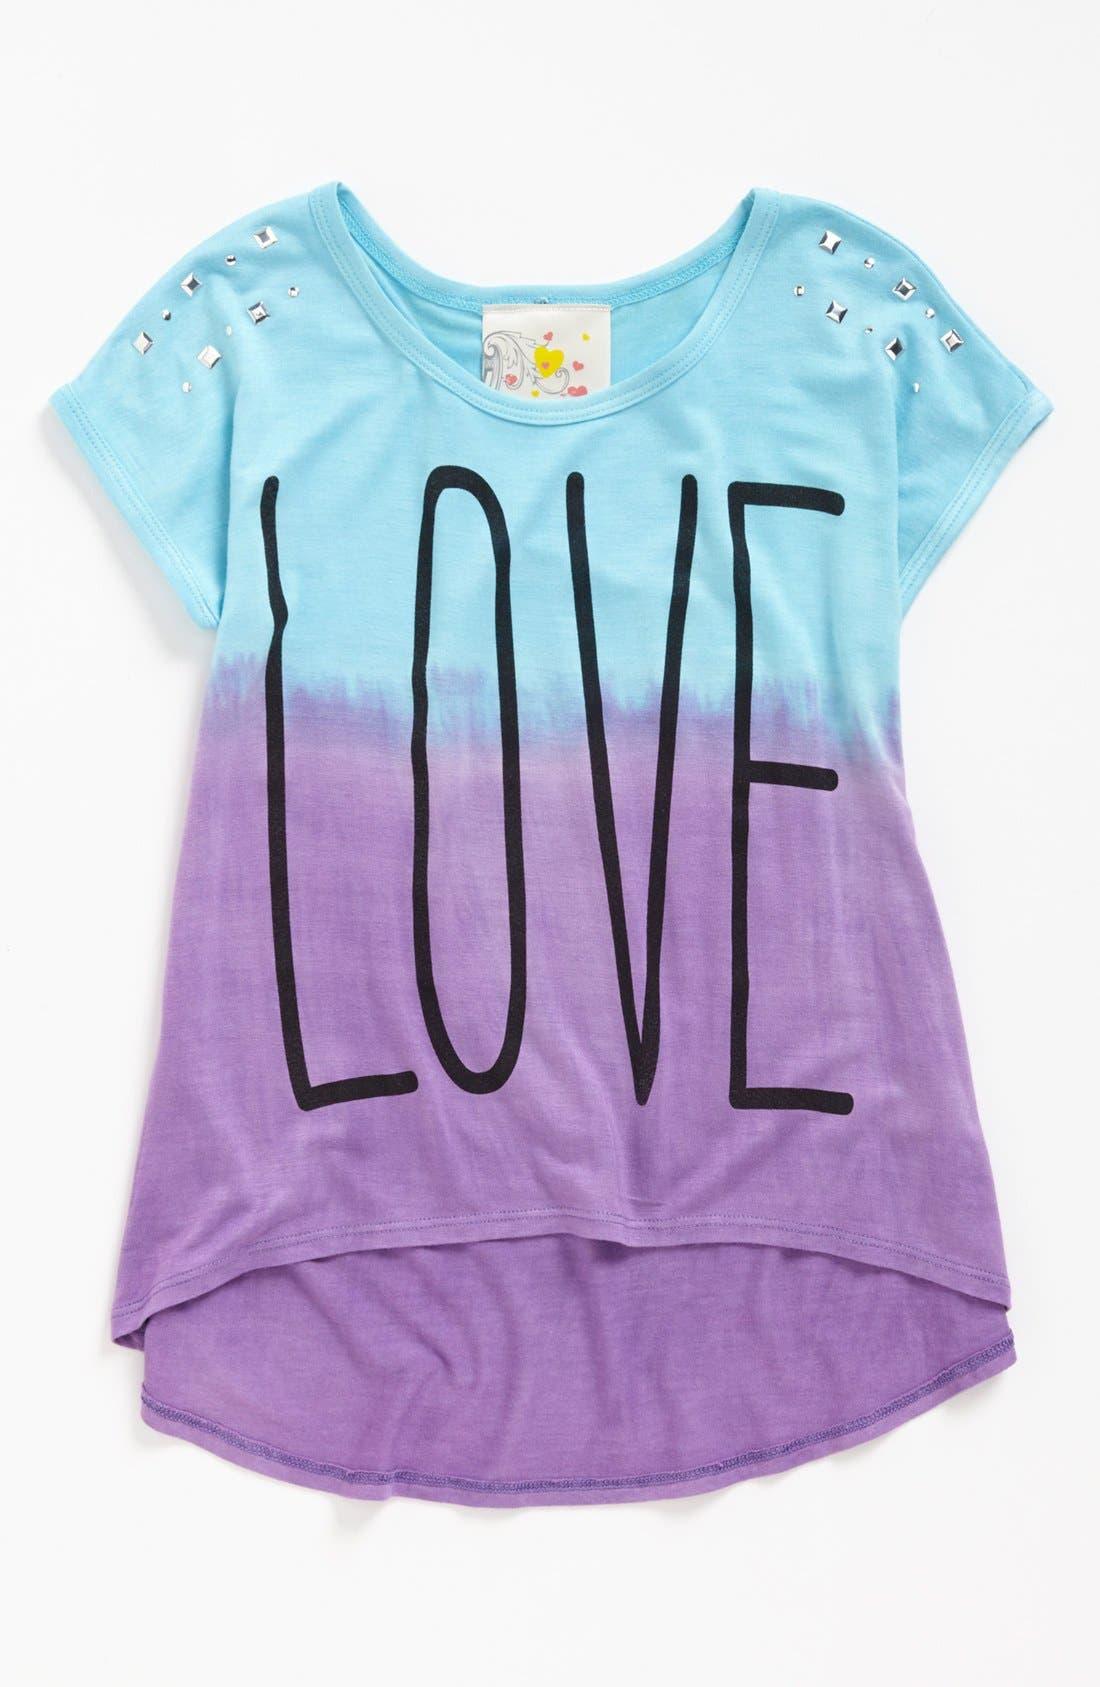 Main Image - Jenna & Jessie 'Love' Top (Little Girls)